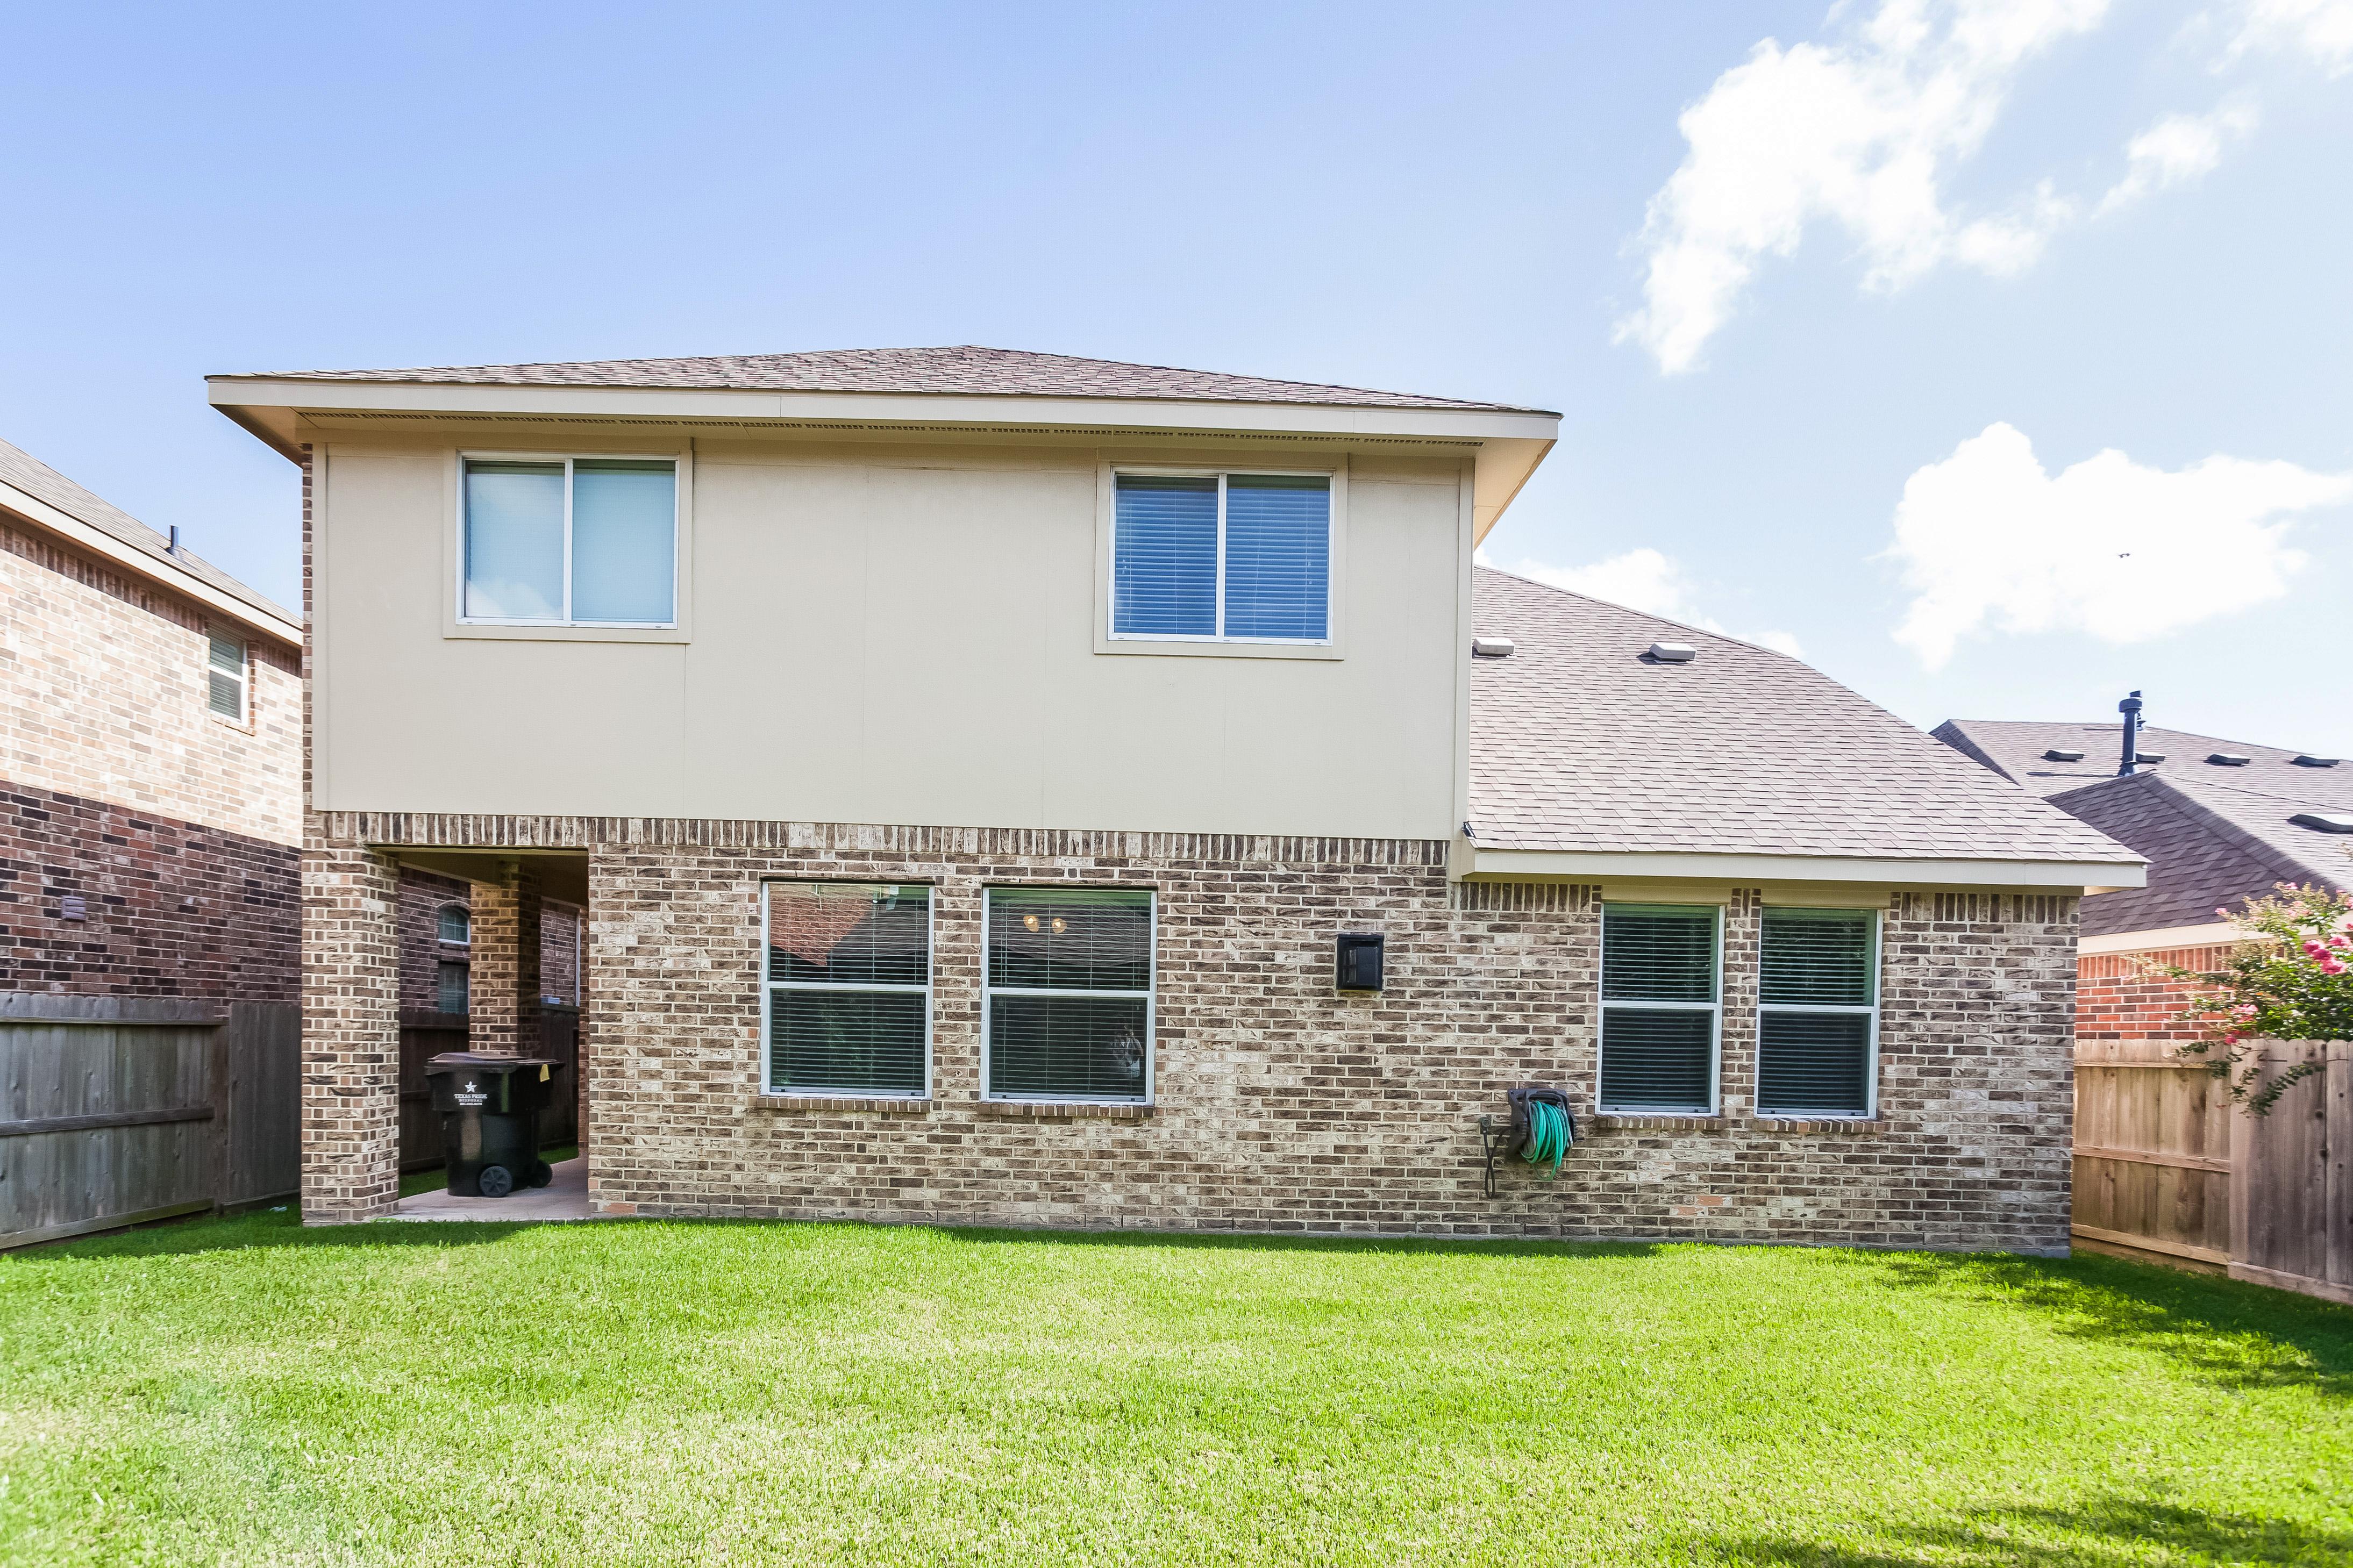 Photo of 24547 Bella Veneza Dr, Richmond, TX, 77406